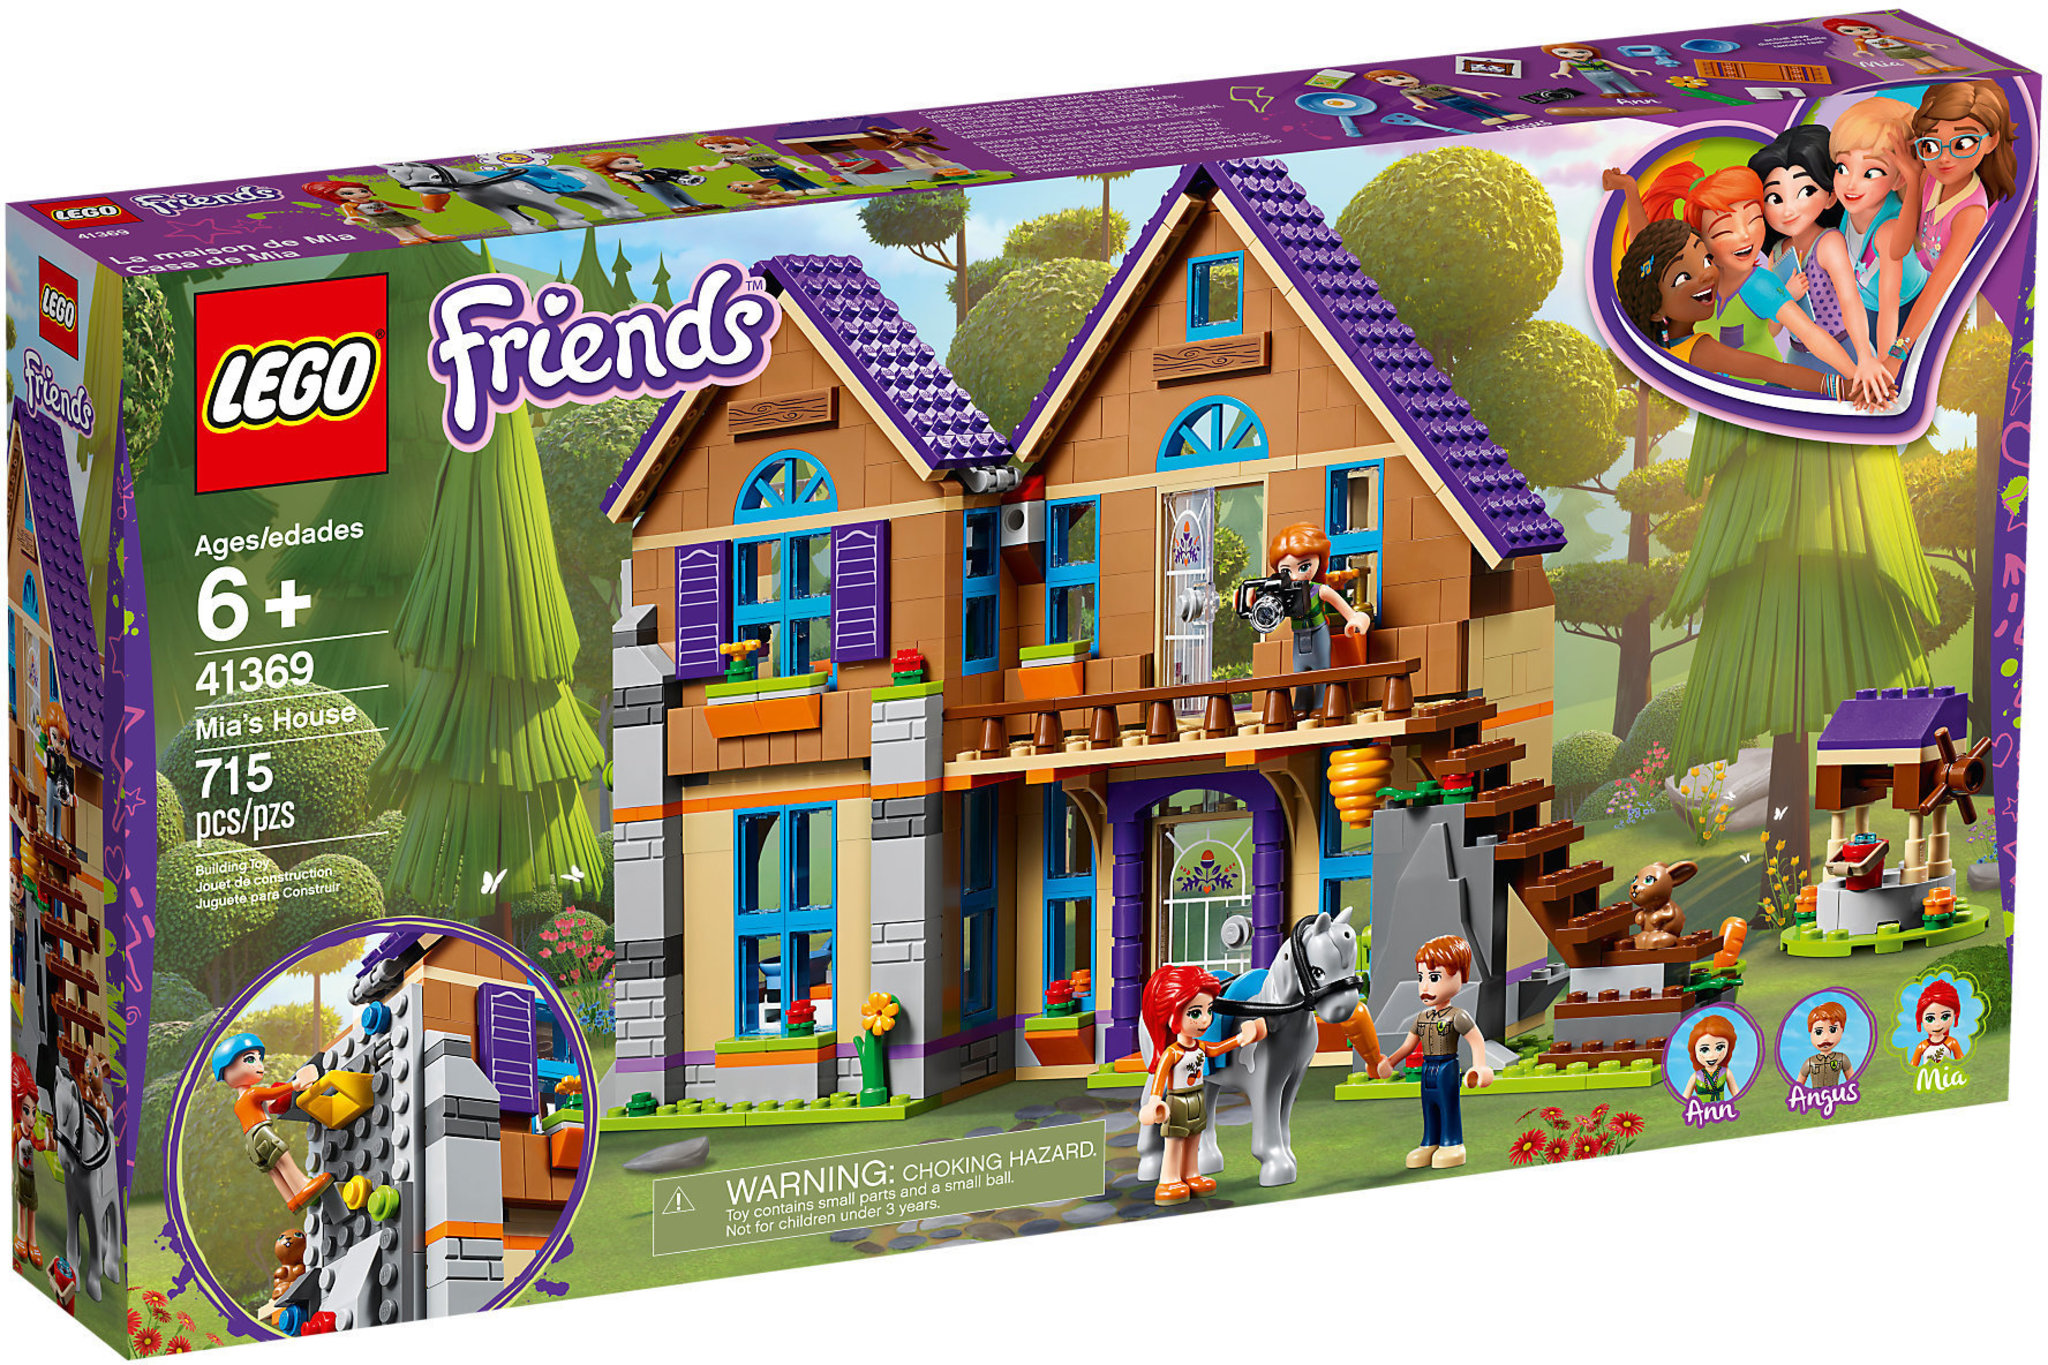 LEGO Friends 41369 - Mia's House